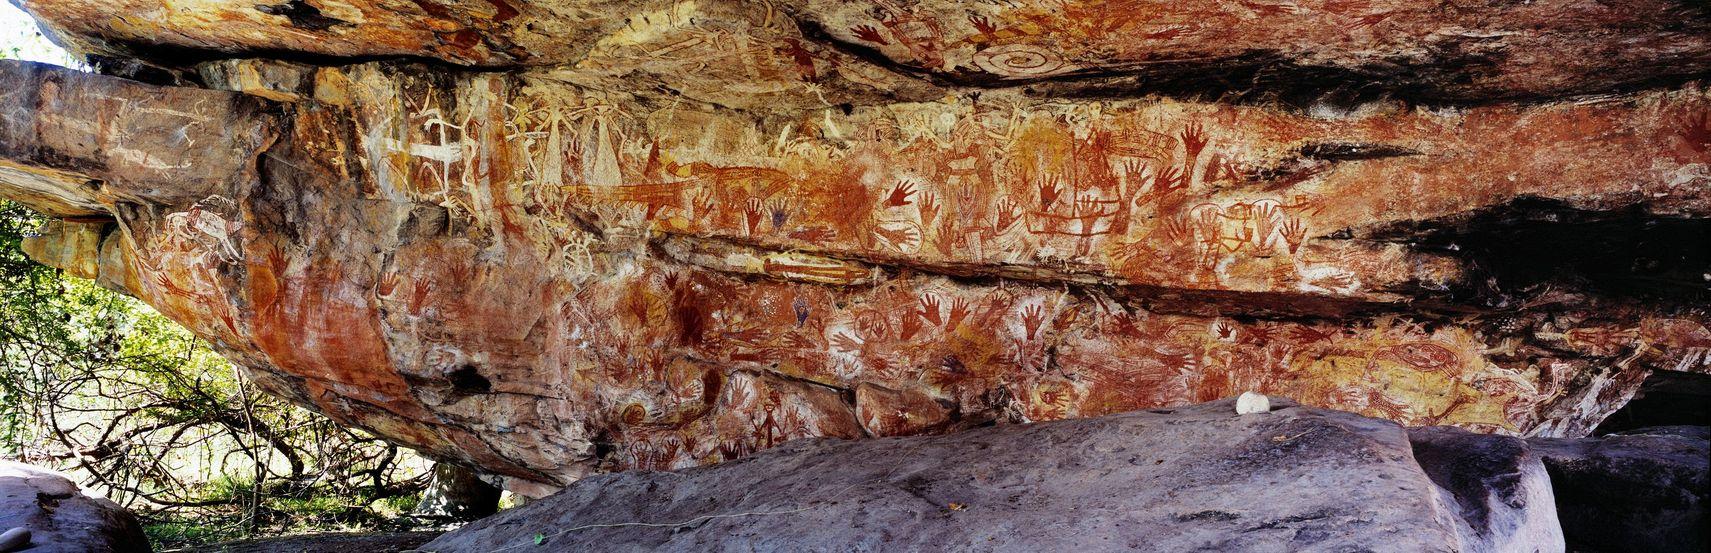 Rock Art Big Wall